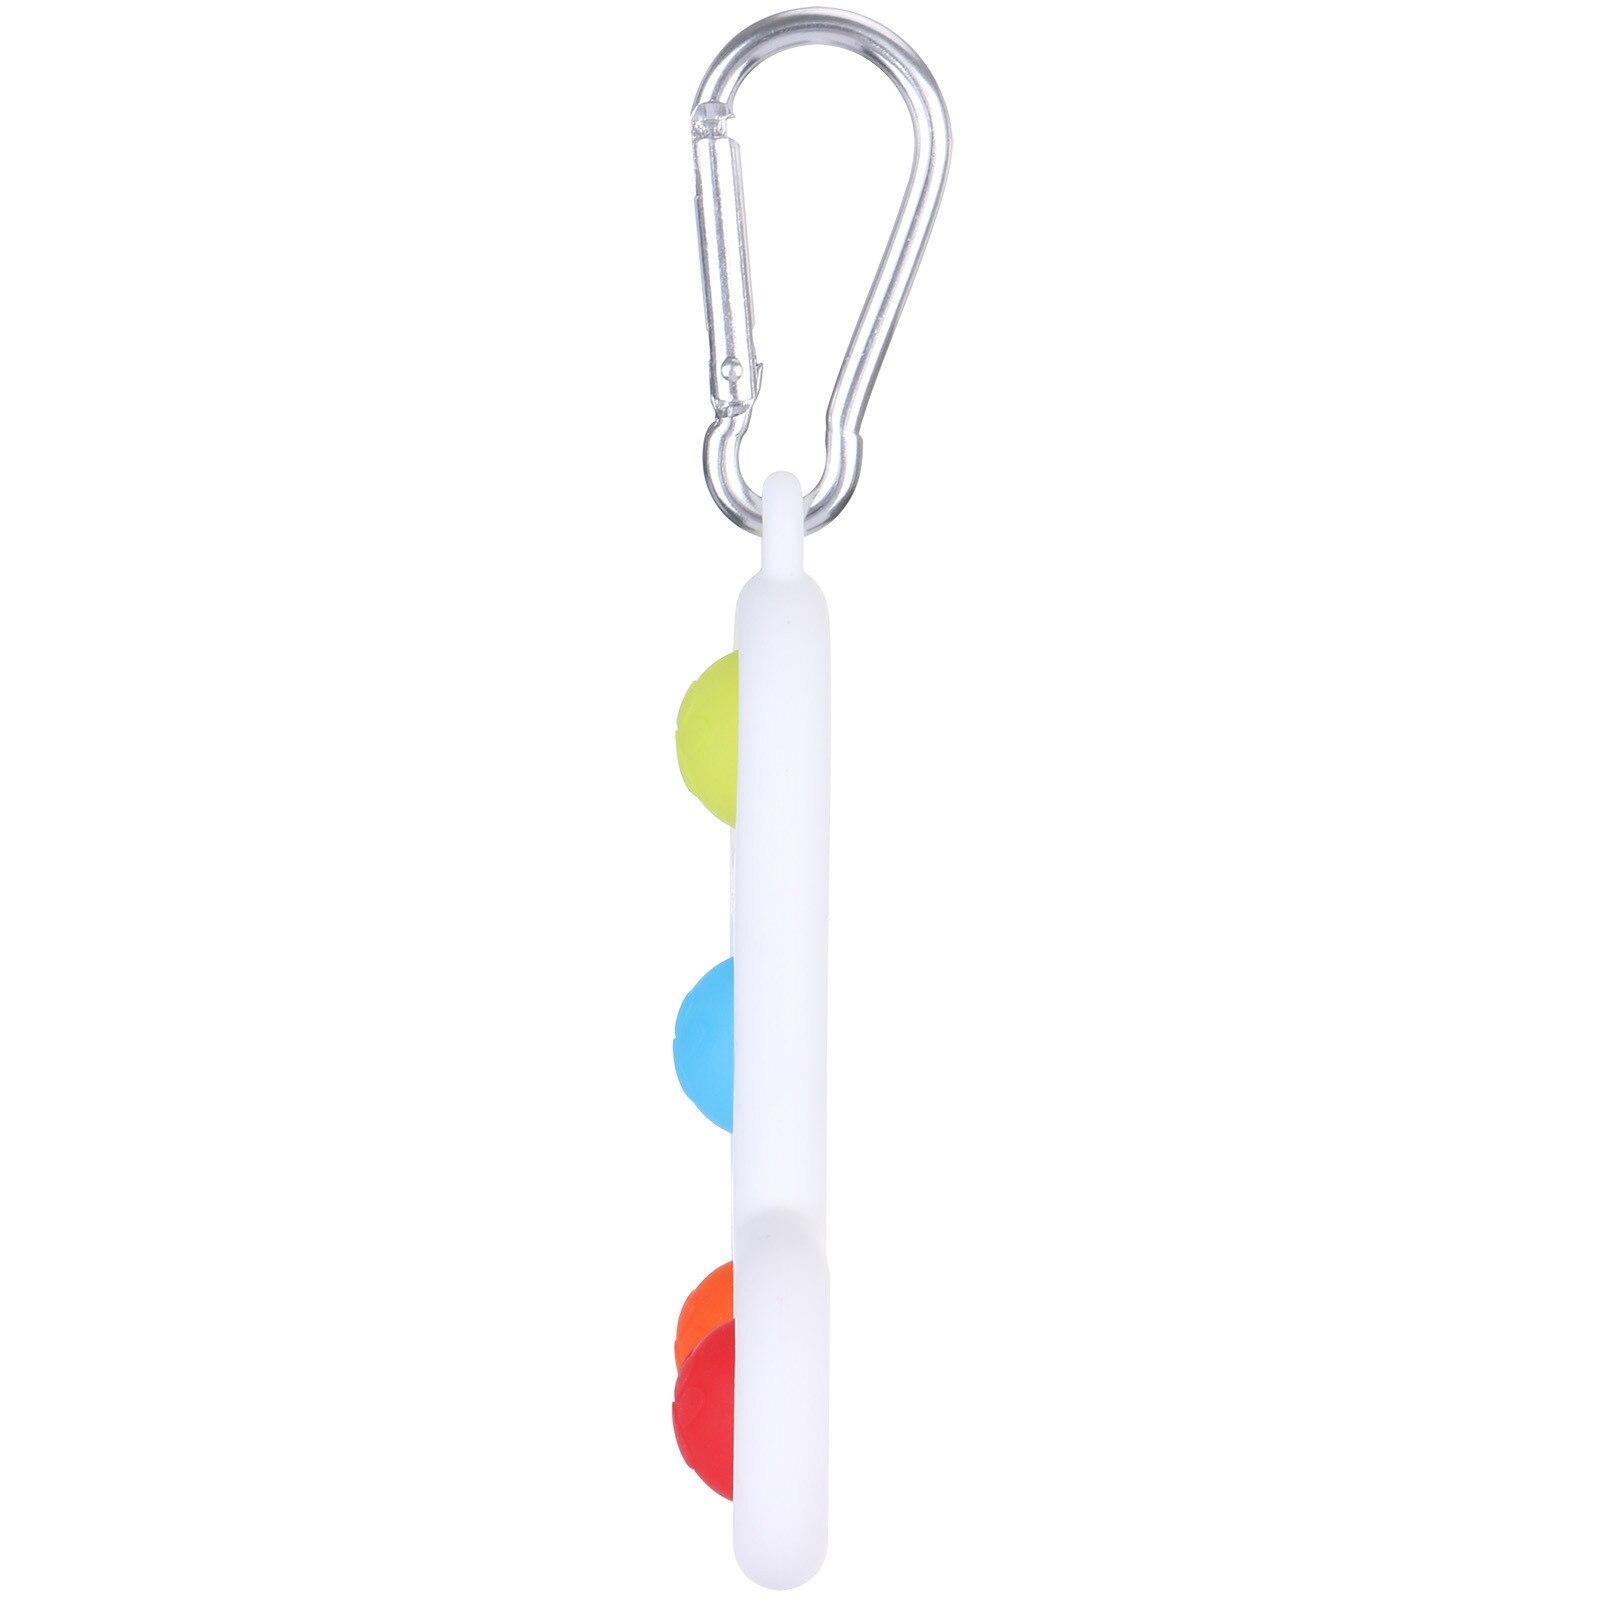 pop it tetris fidget toy 4838 - Wacky Track